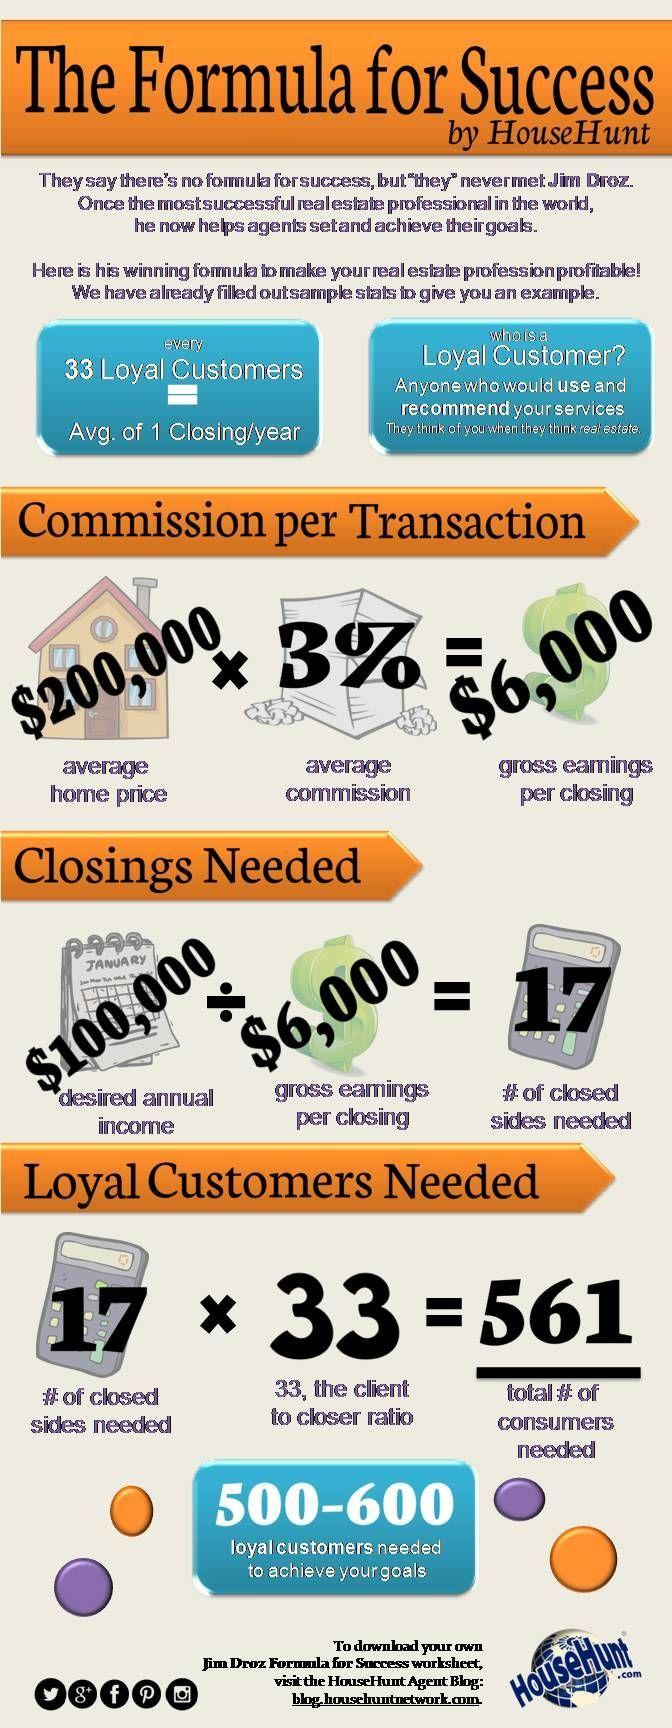 Best Real Estate Images On   Real Estate Business